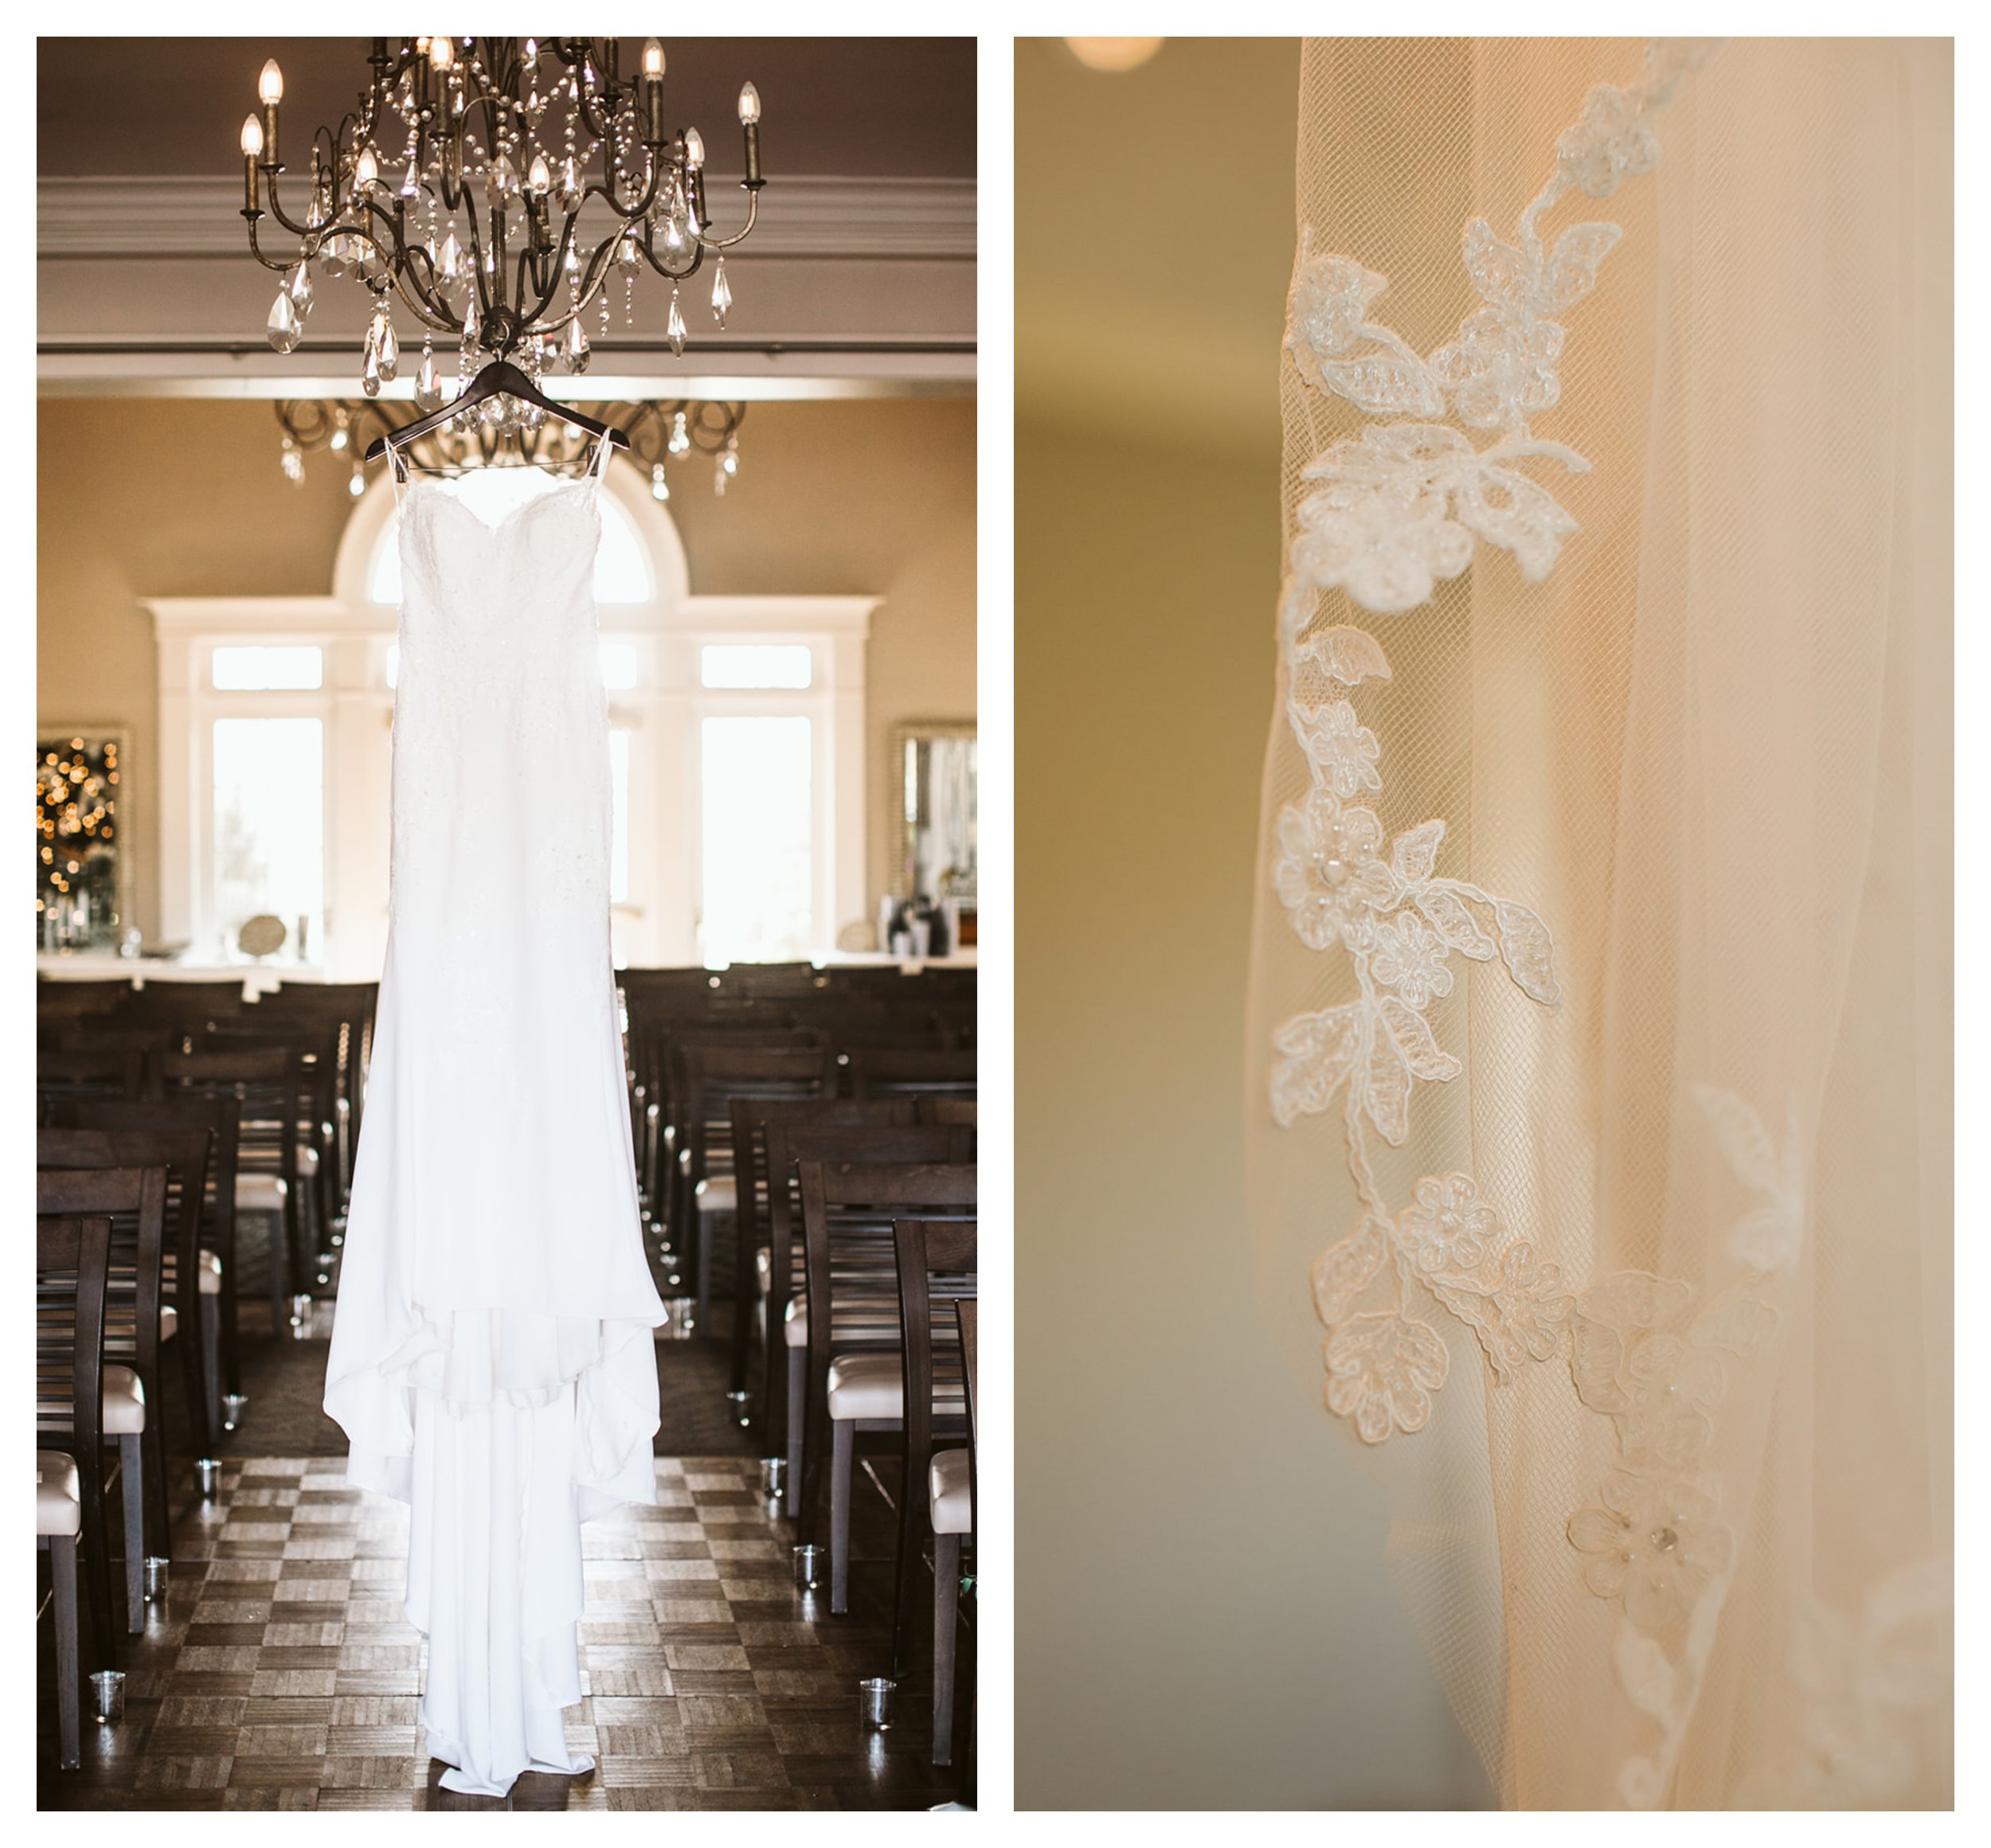 kc bridal gown shopping